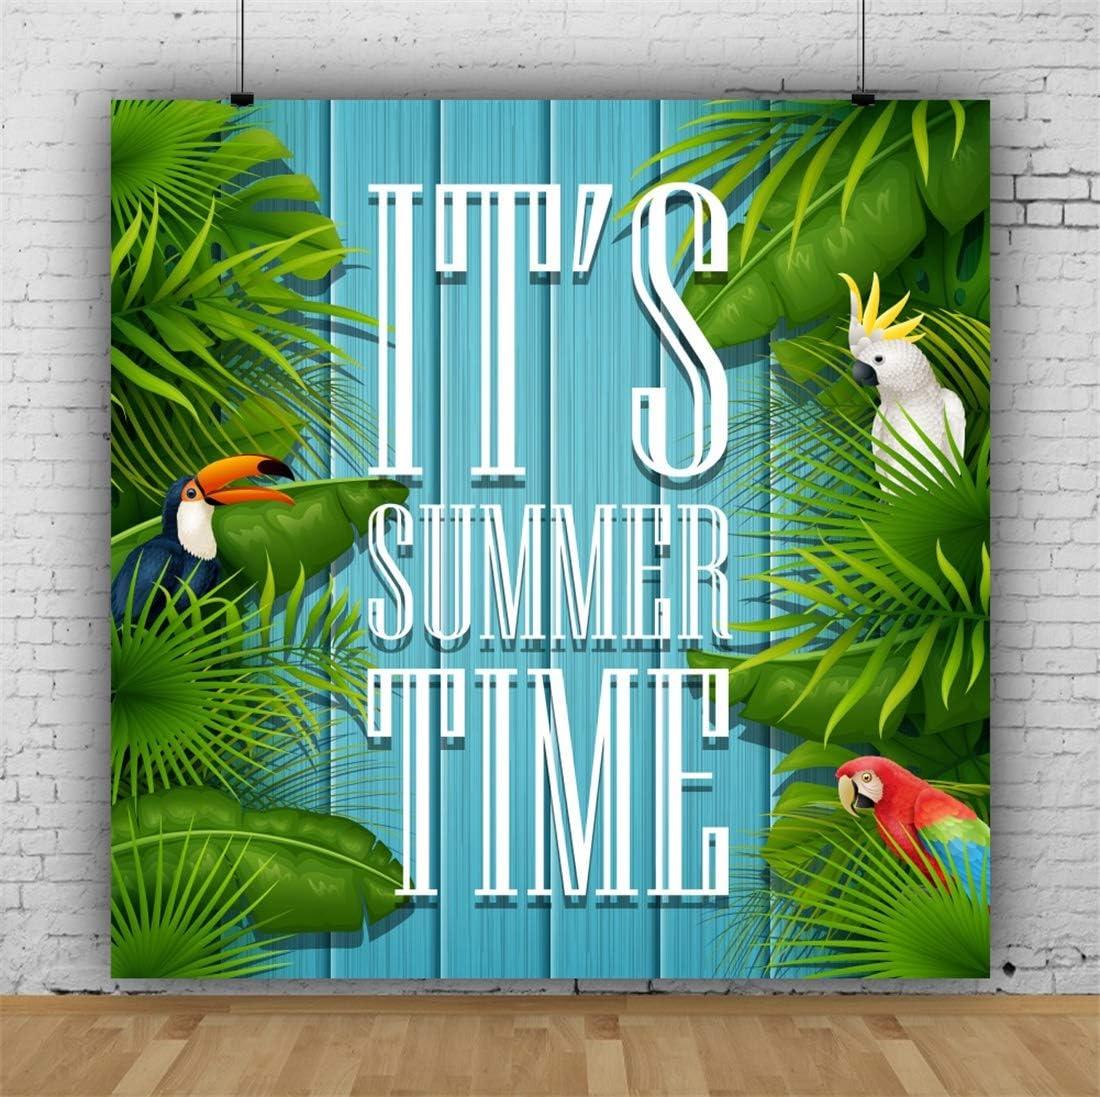 Yeele 10x10ft Summer Time Photography Background Cartoon Bird Parrot Green Plant Palm Tree Sea Blue Wooden Plank Photo Backdrop Studio Props Video Drape